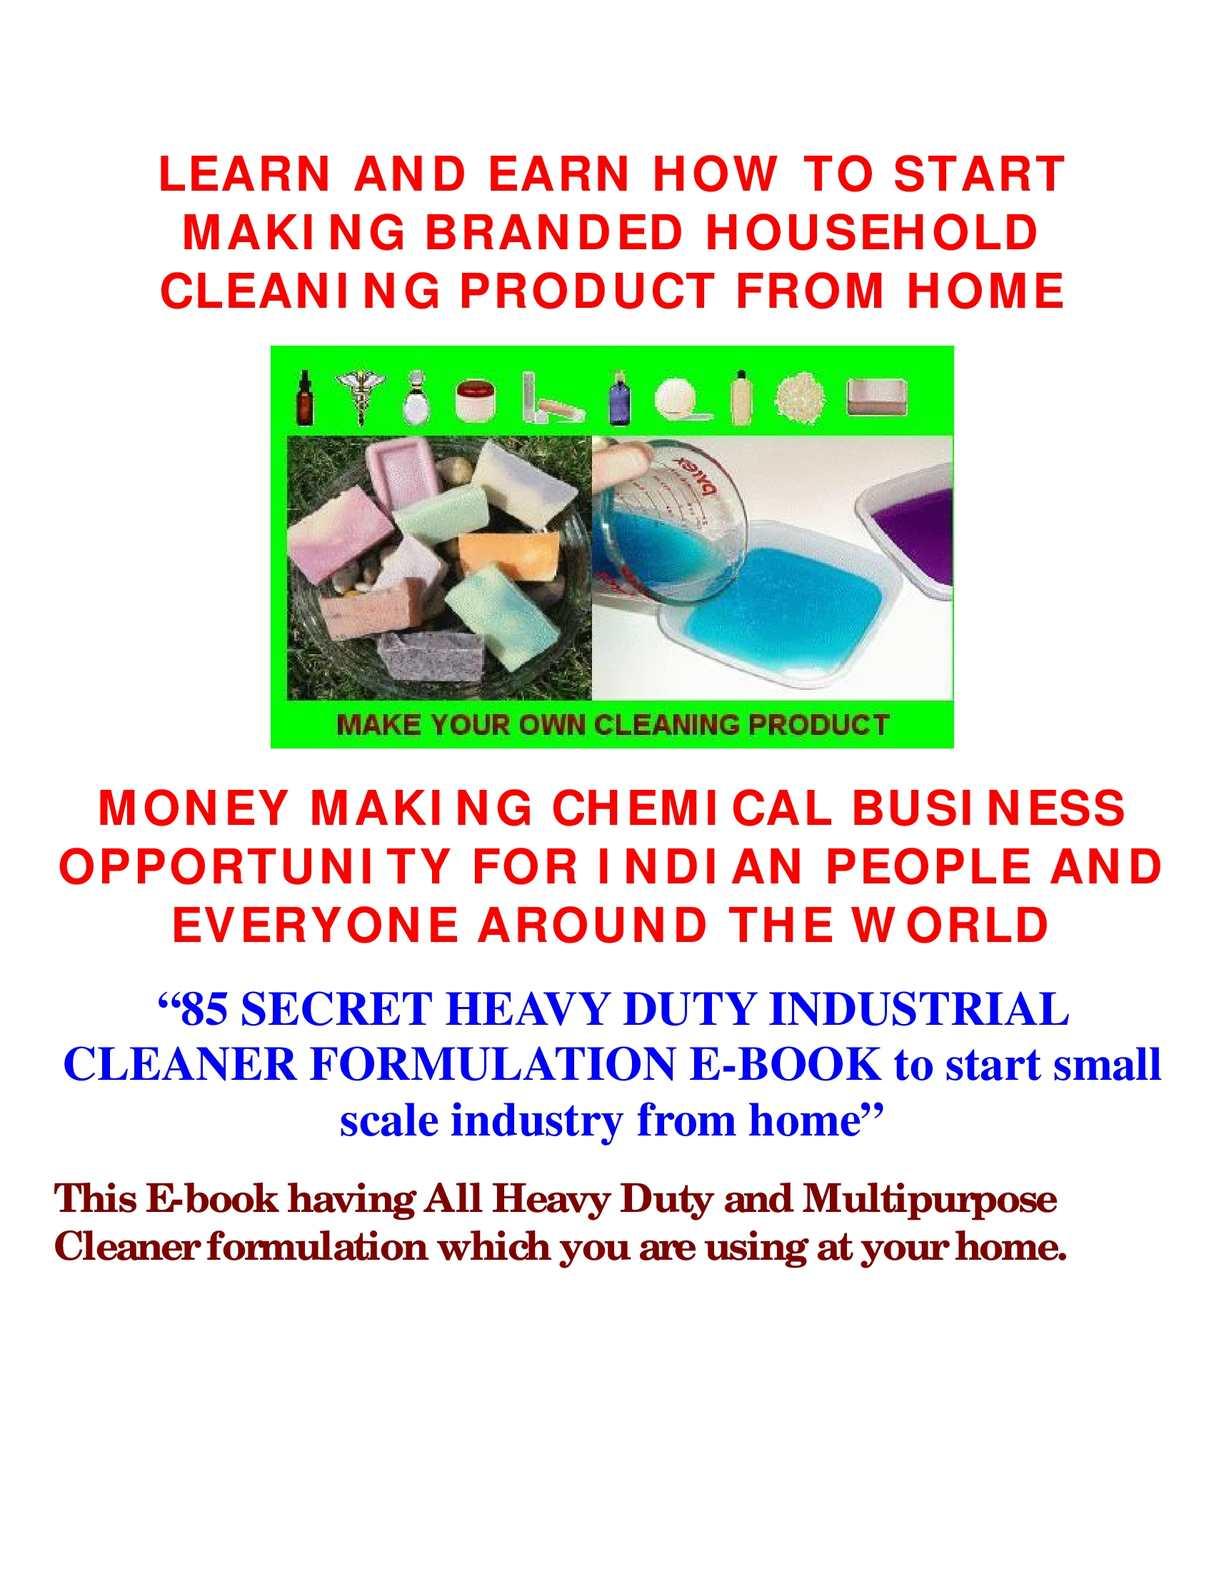 benzene cleaner india